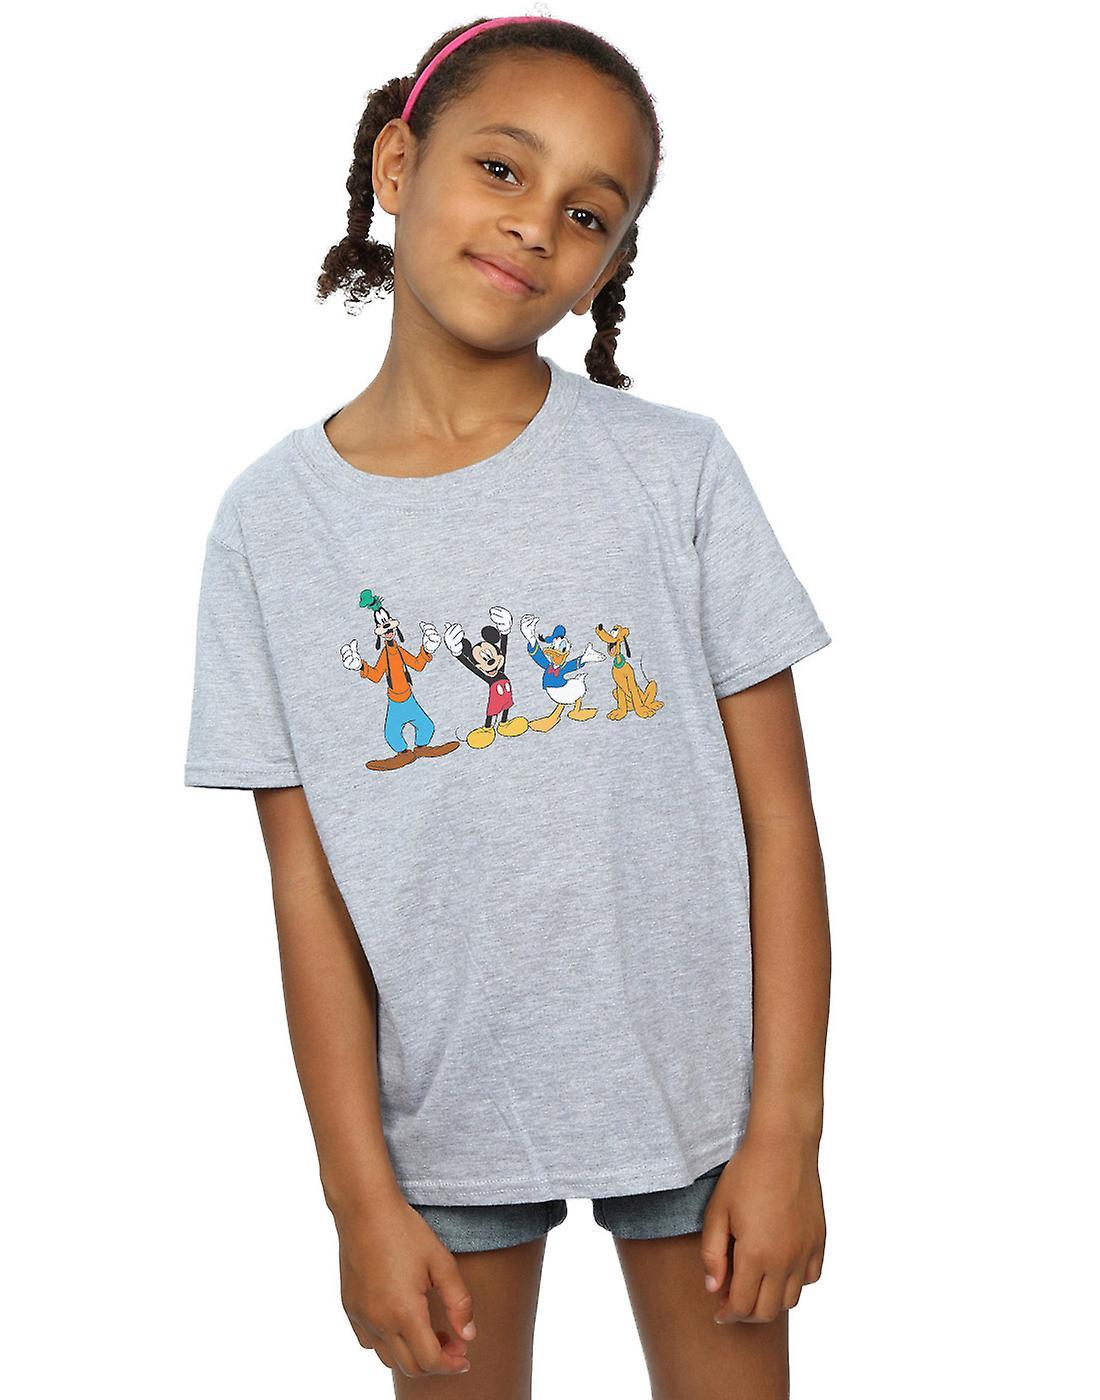 Disney Girls Mickey Mouse Friends T-Shirt